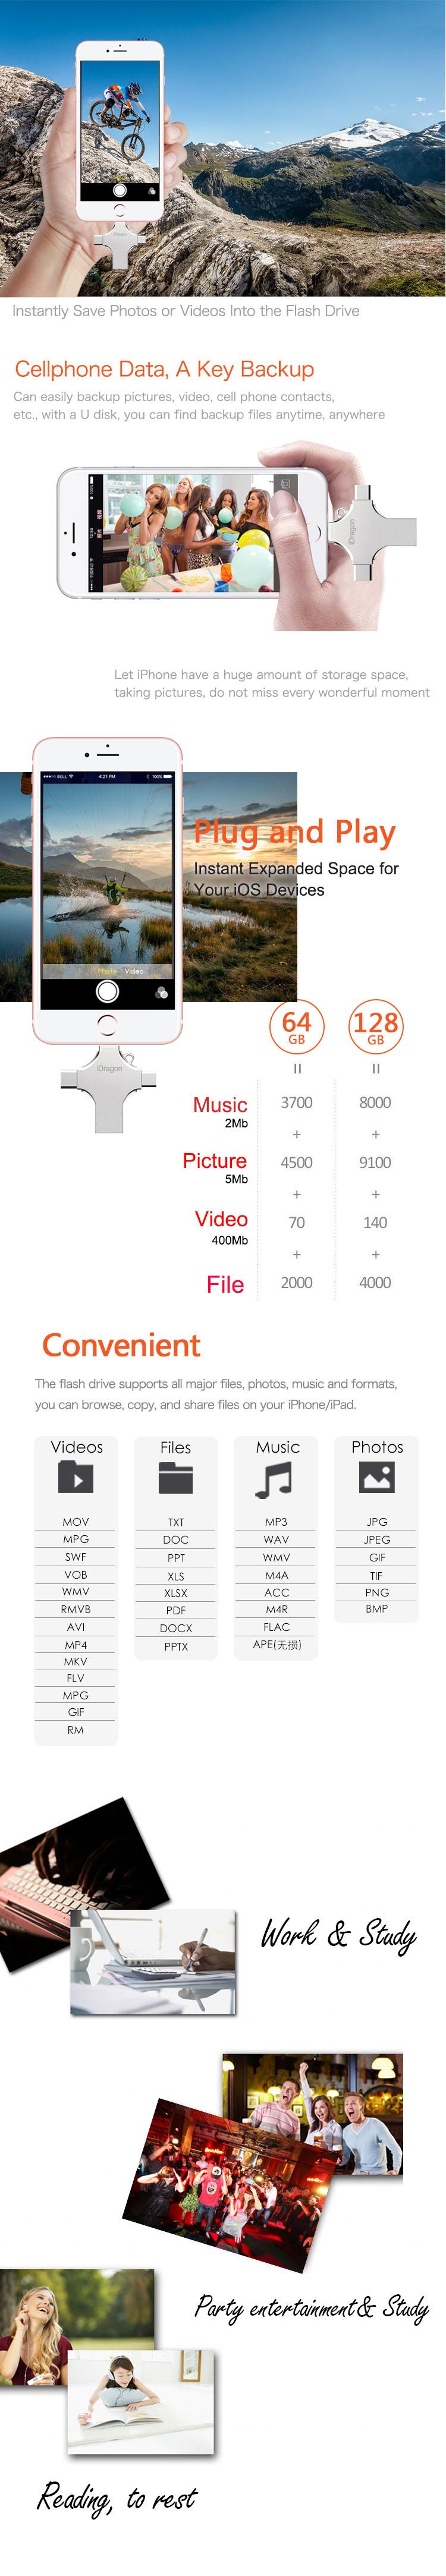 4in1 USB Flash Drive